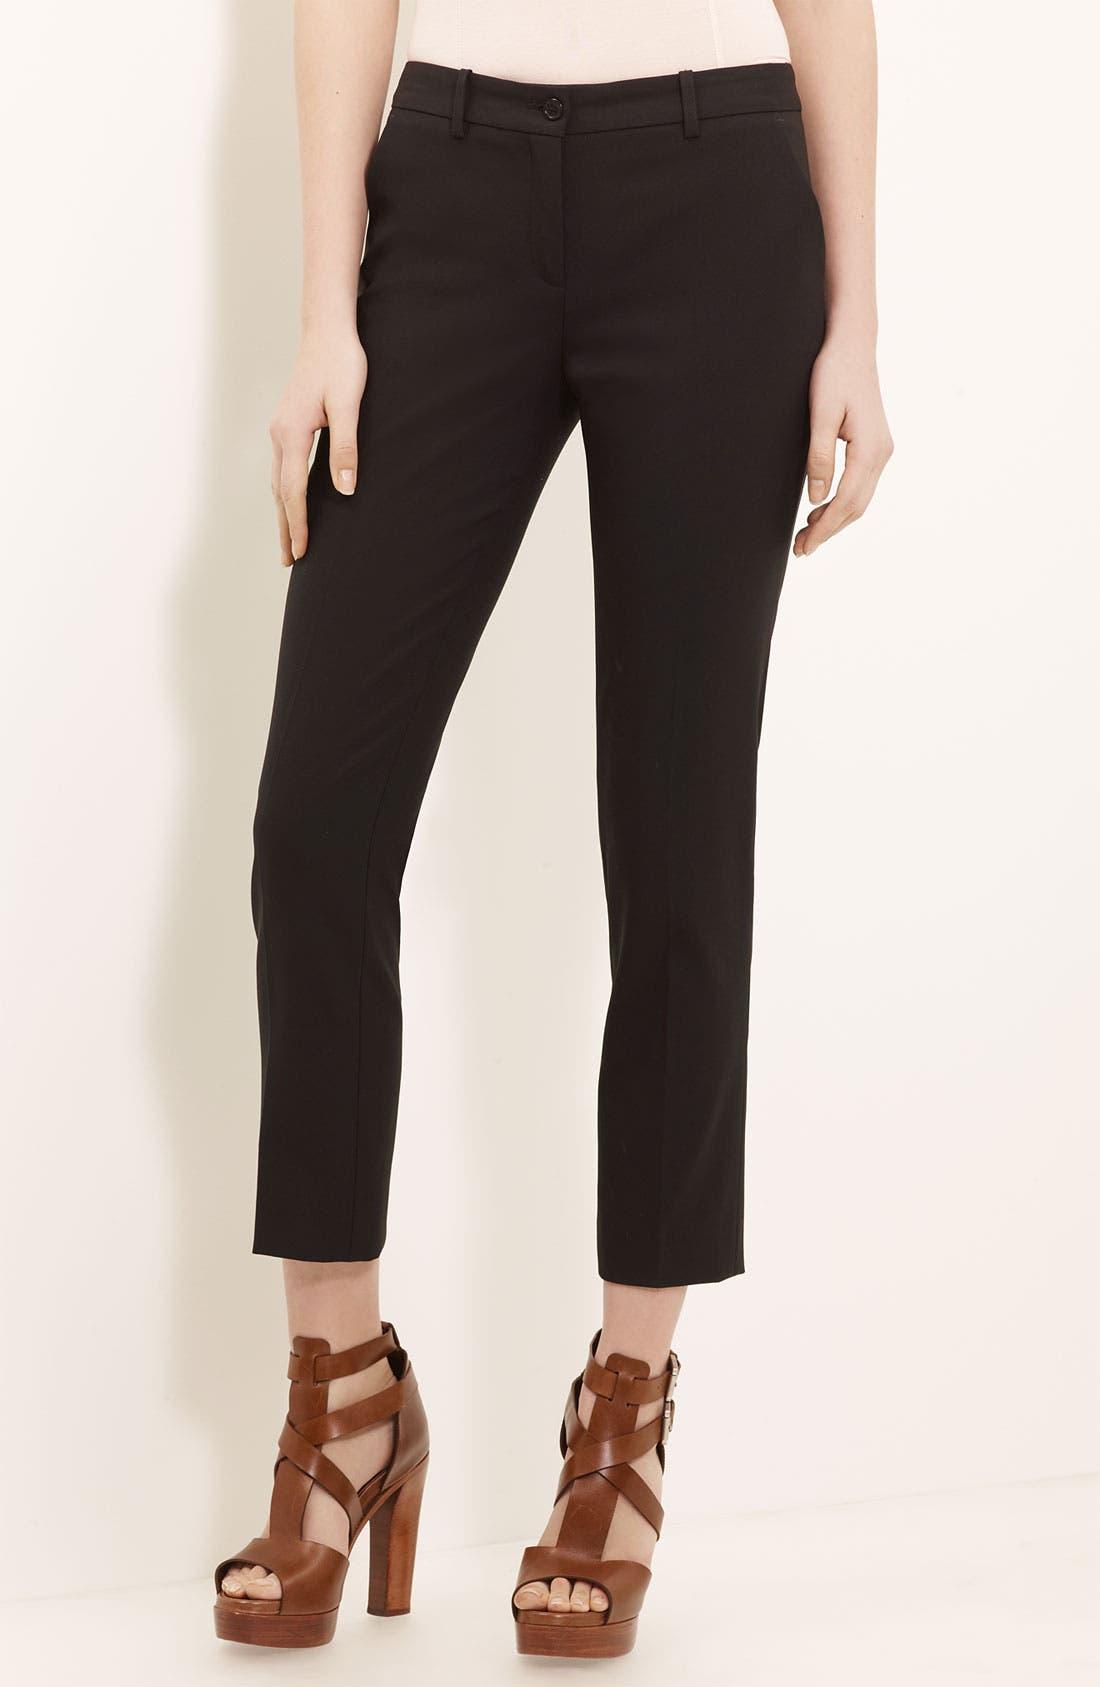 Main Image - Michael Kors 'Samantha' Skinny Pants